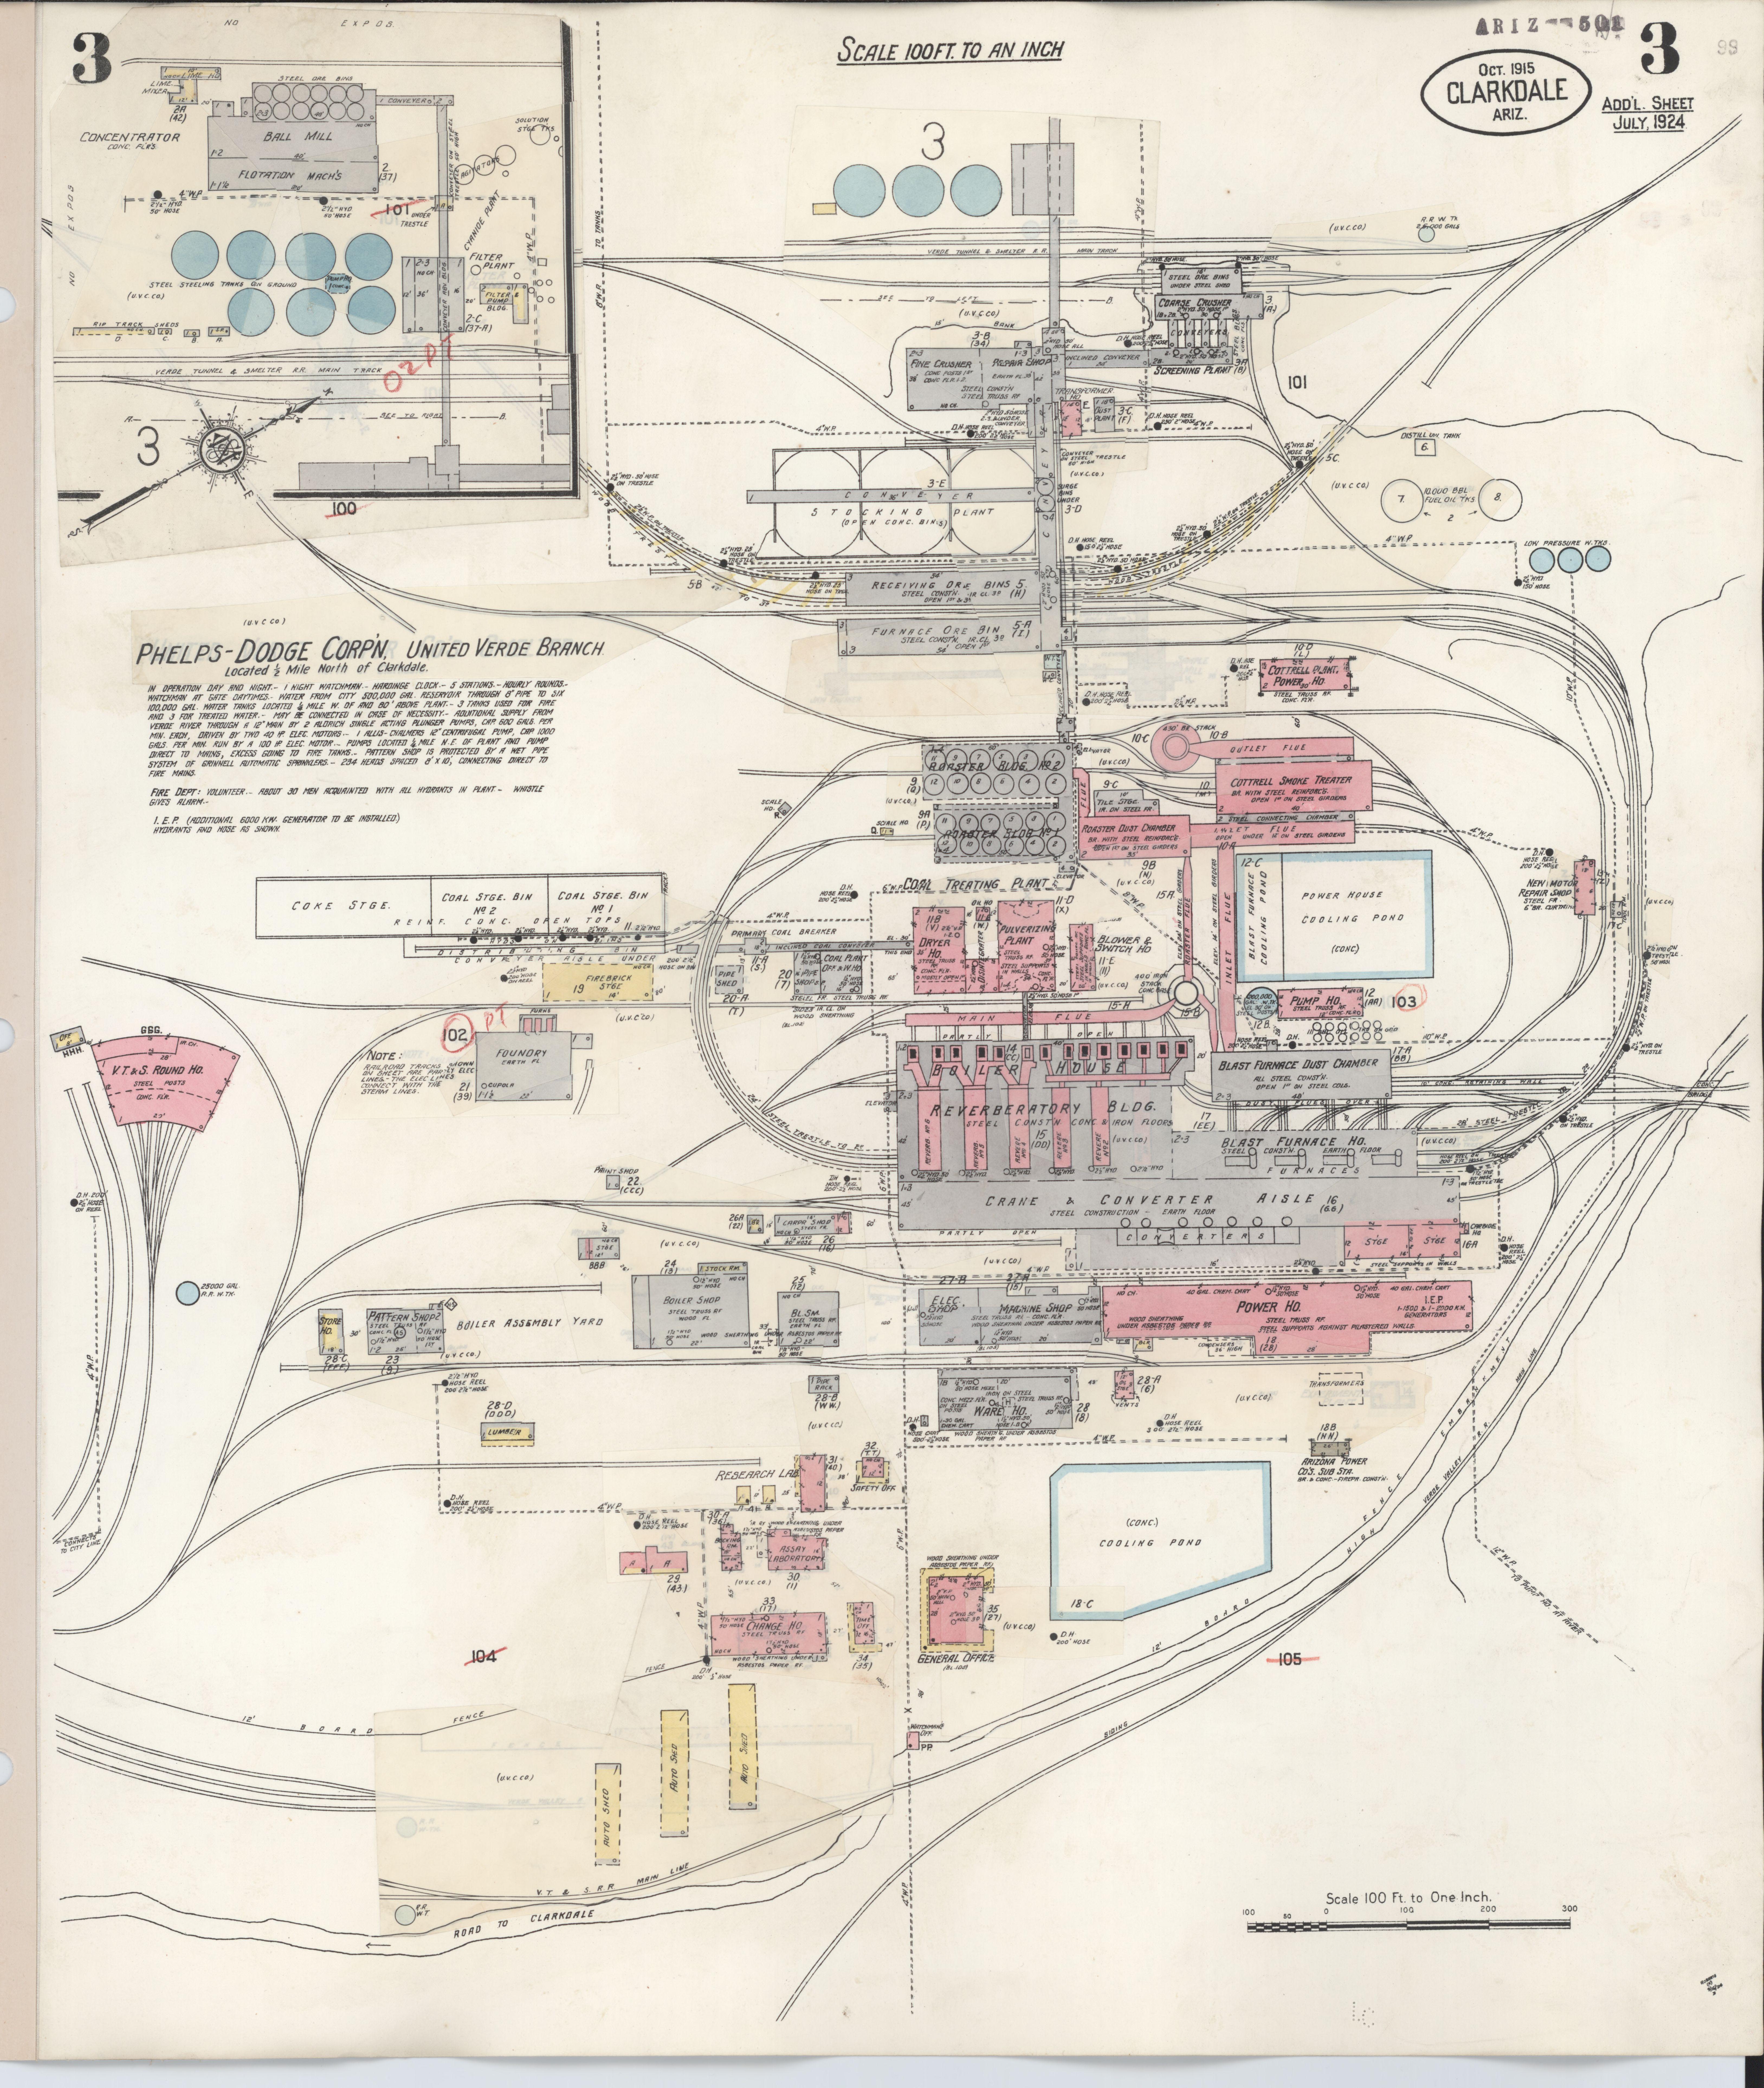 File:Sanborn Fire Insurance Map from Clarkdale, Yavapai